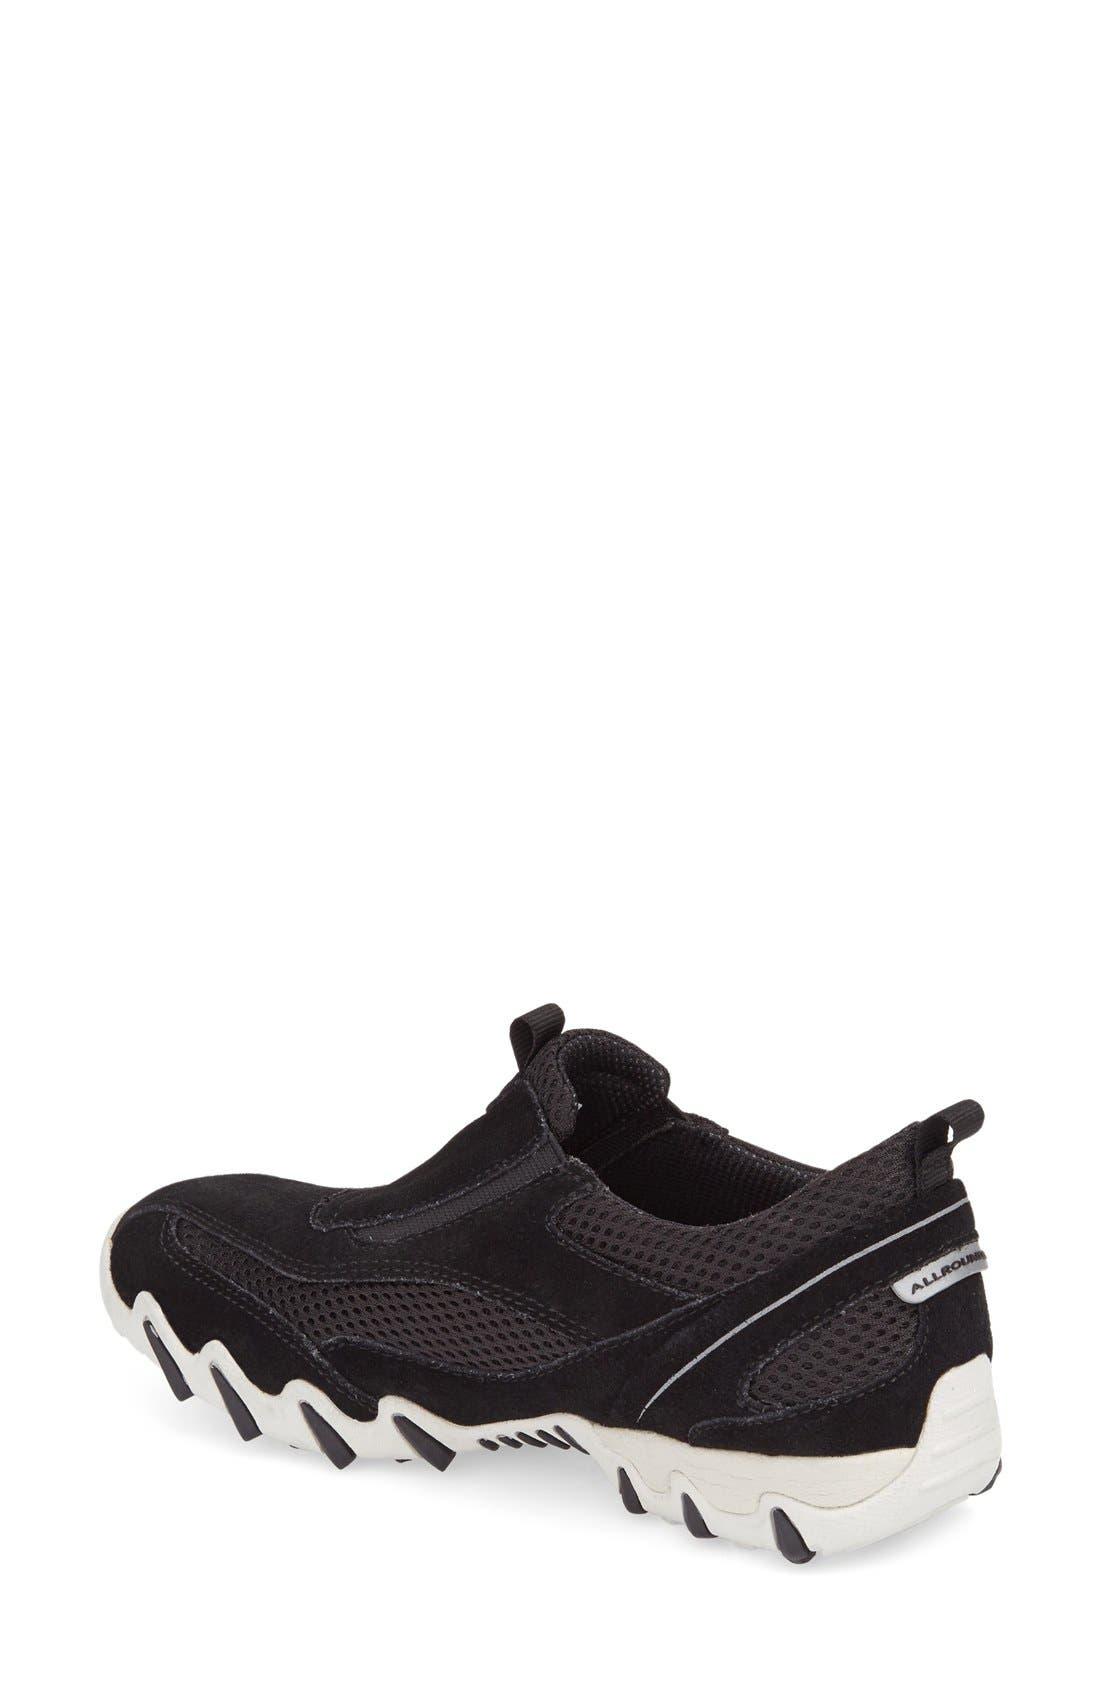 'Nawaja' Slip-On Sneaker,                             Alternate thumbnail 2, color,                             011